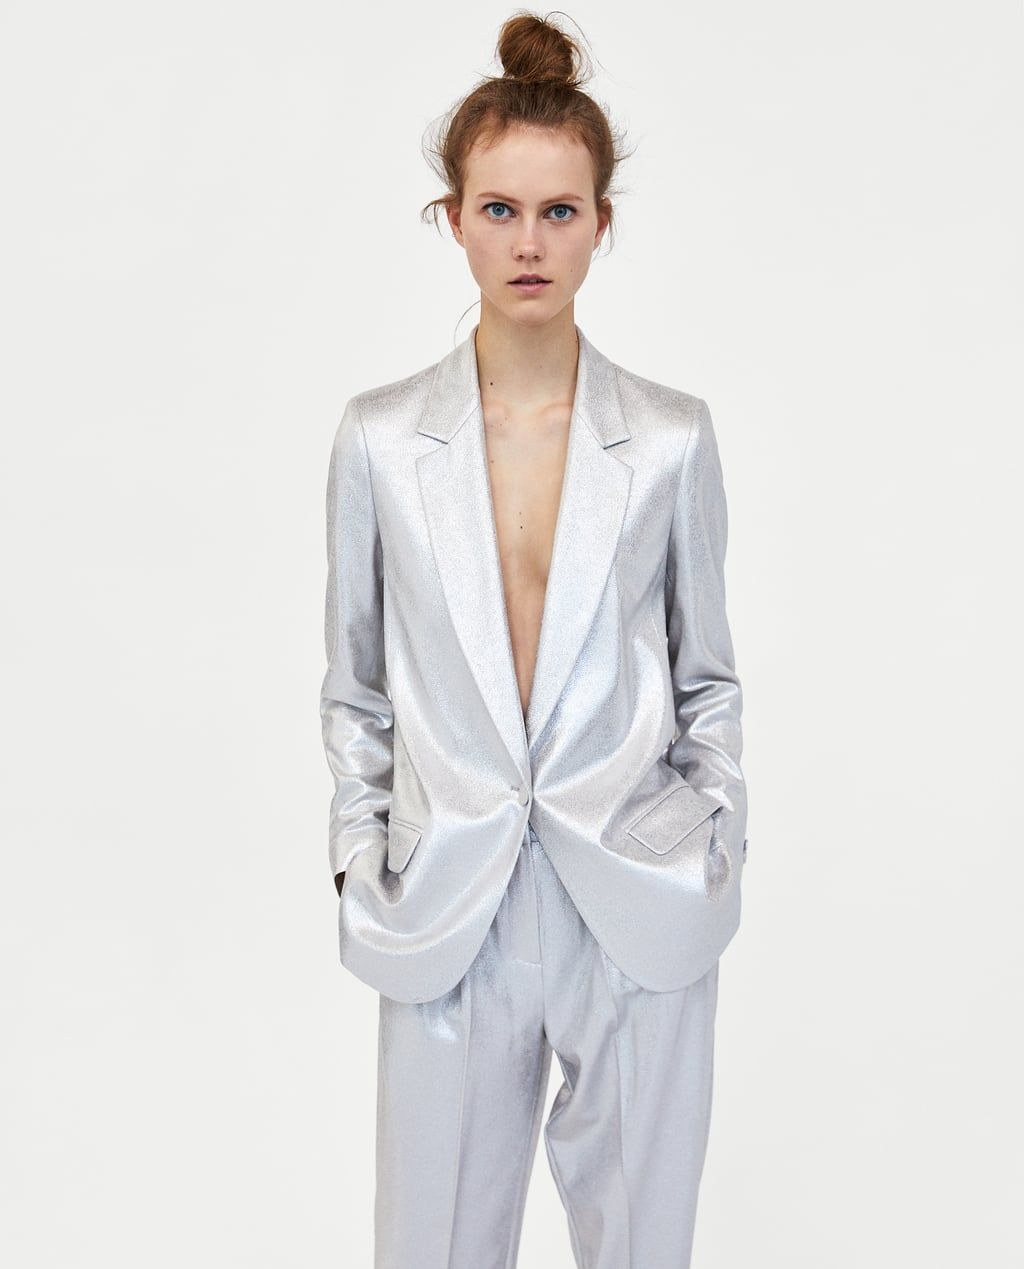 3e707e82f0 Women's Blazers | New Collection Online | ZARA United States ...